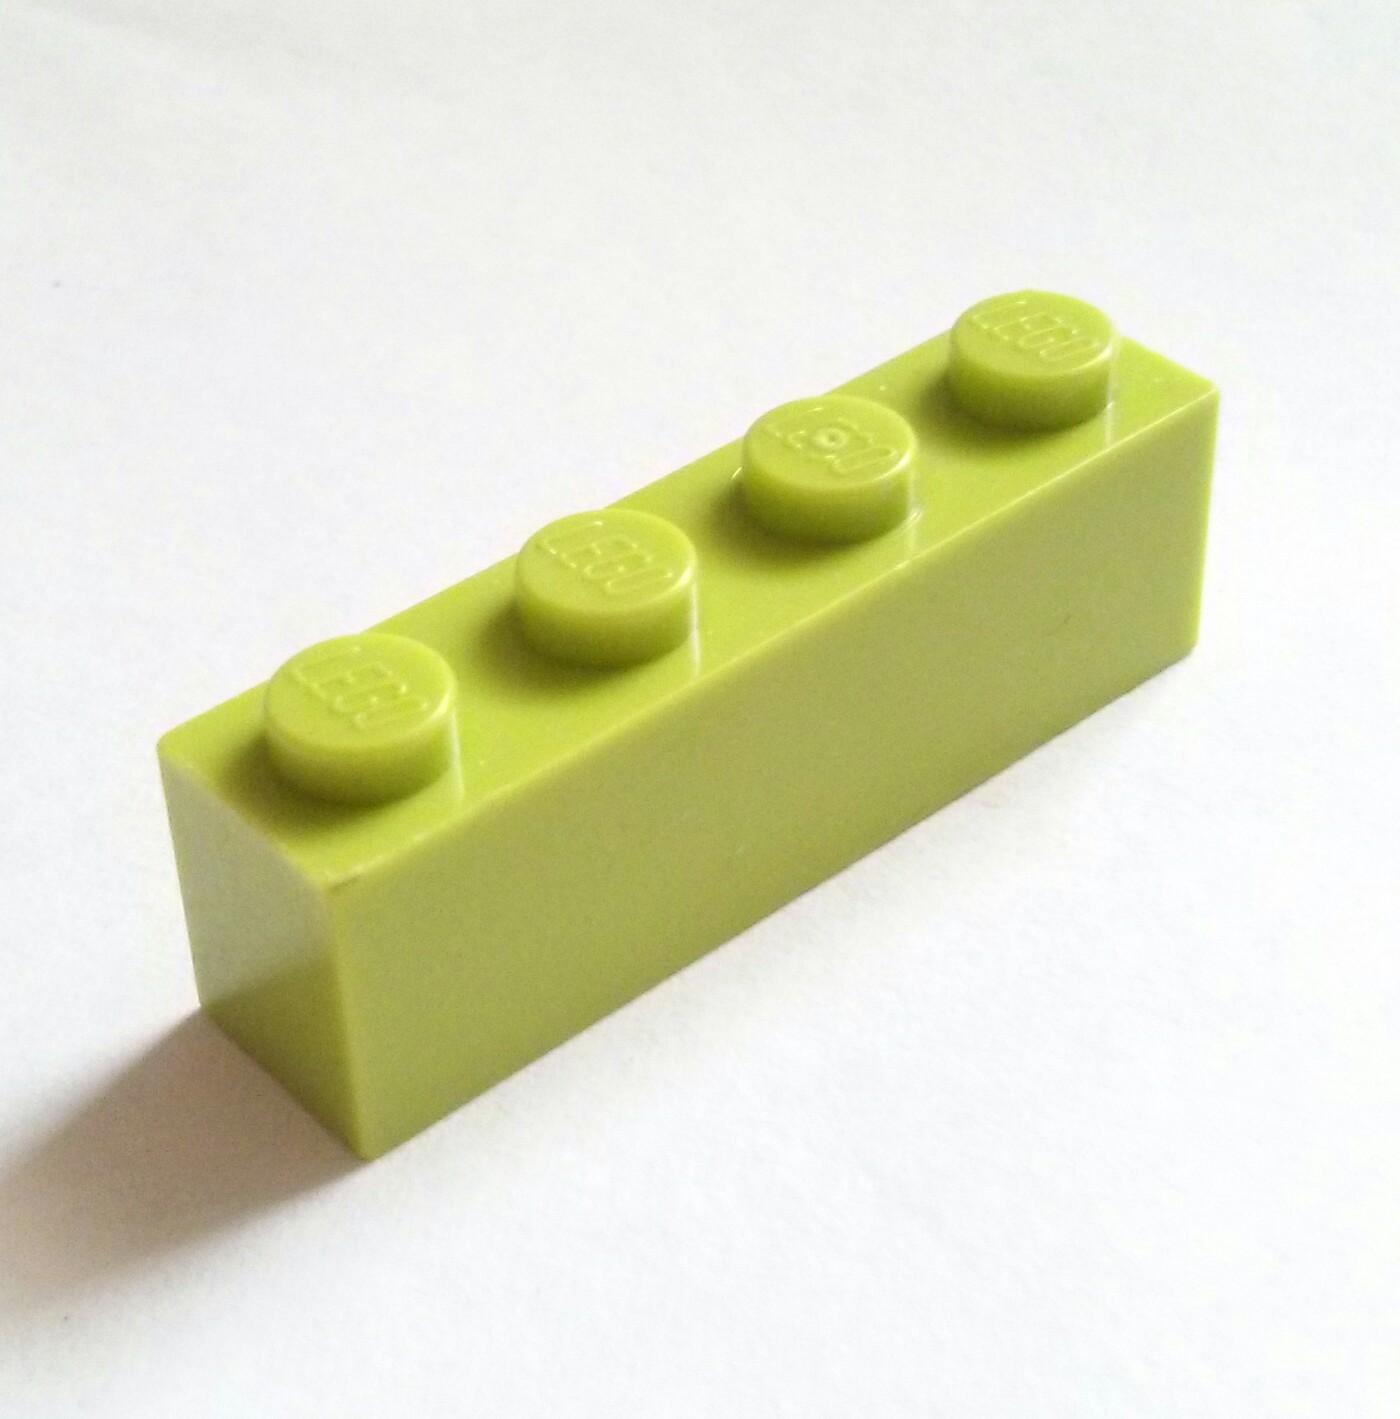 Lime Brick On Image : Lime brick